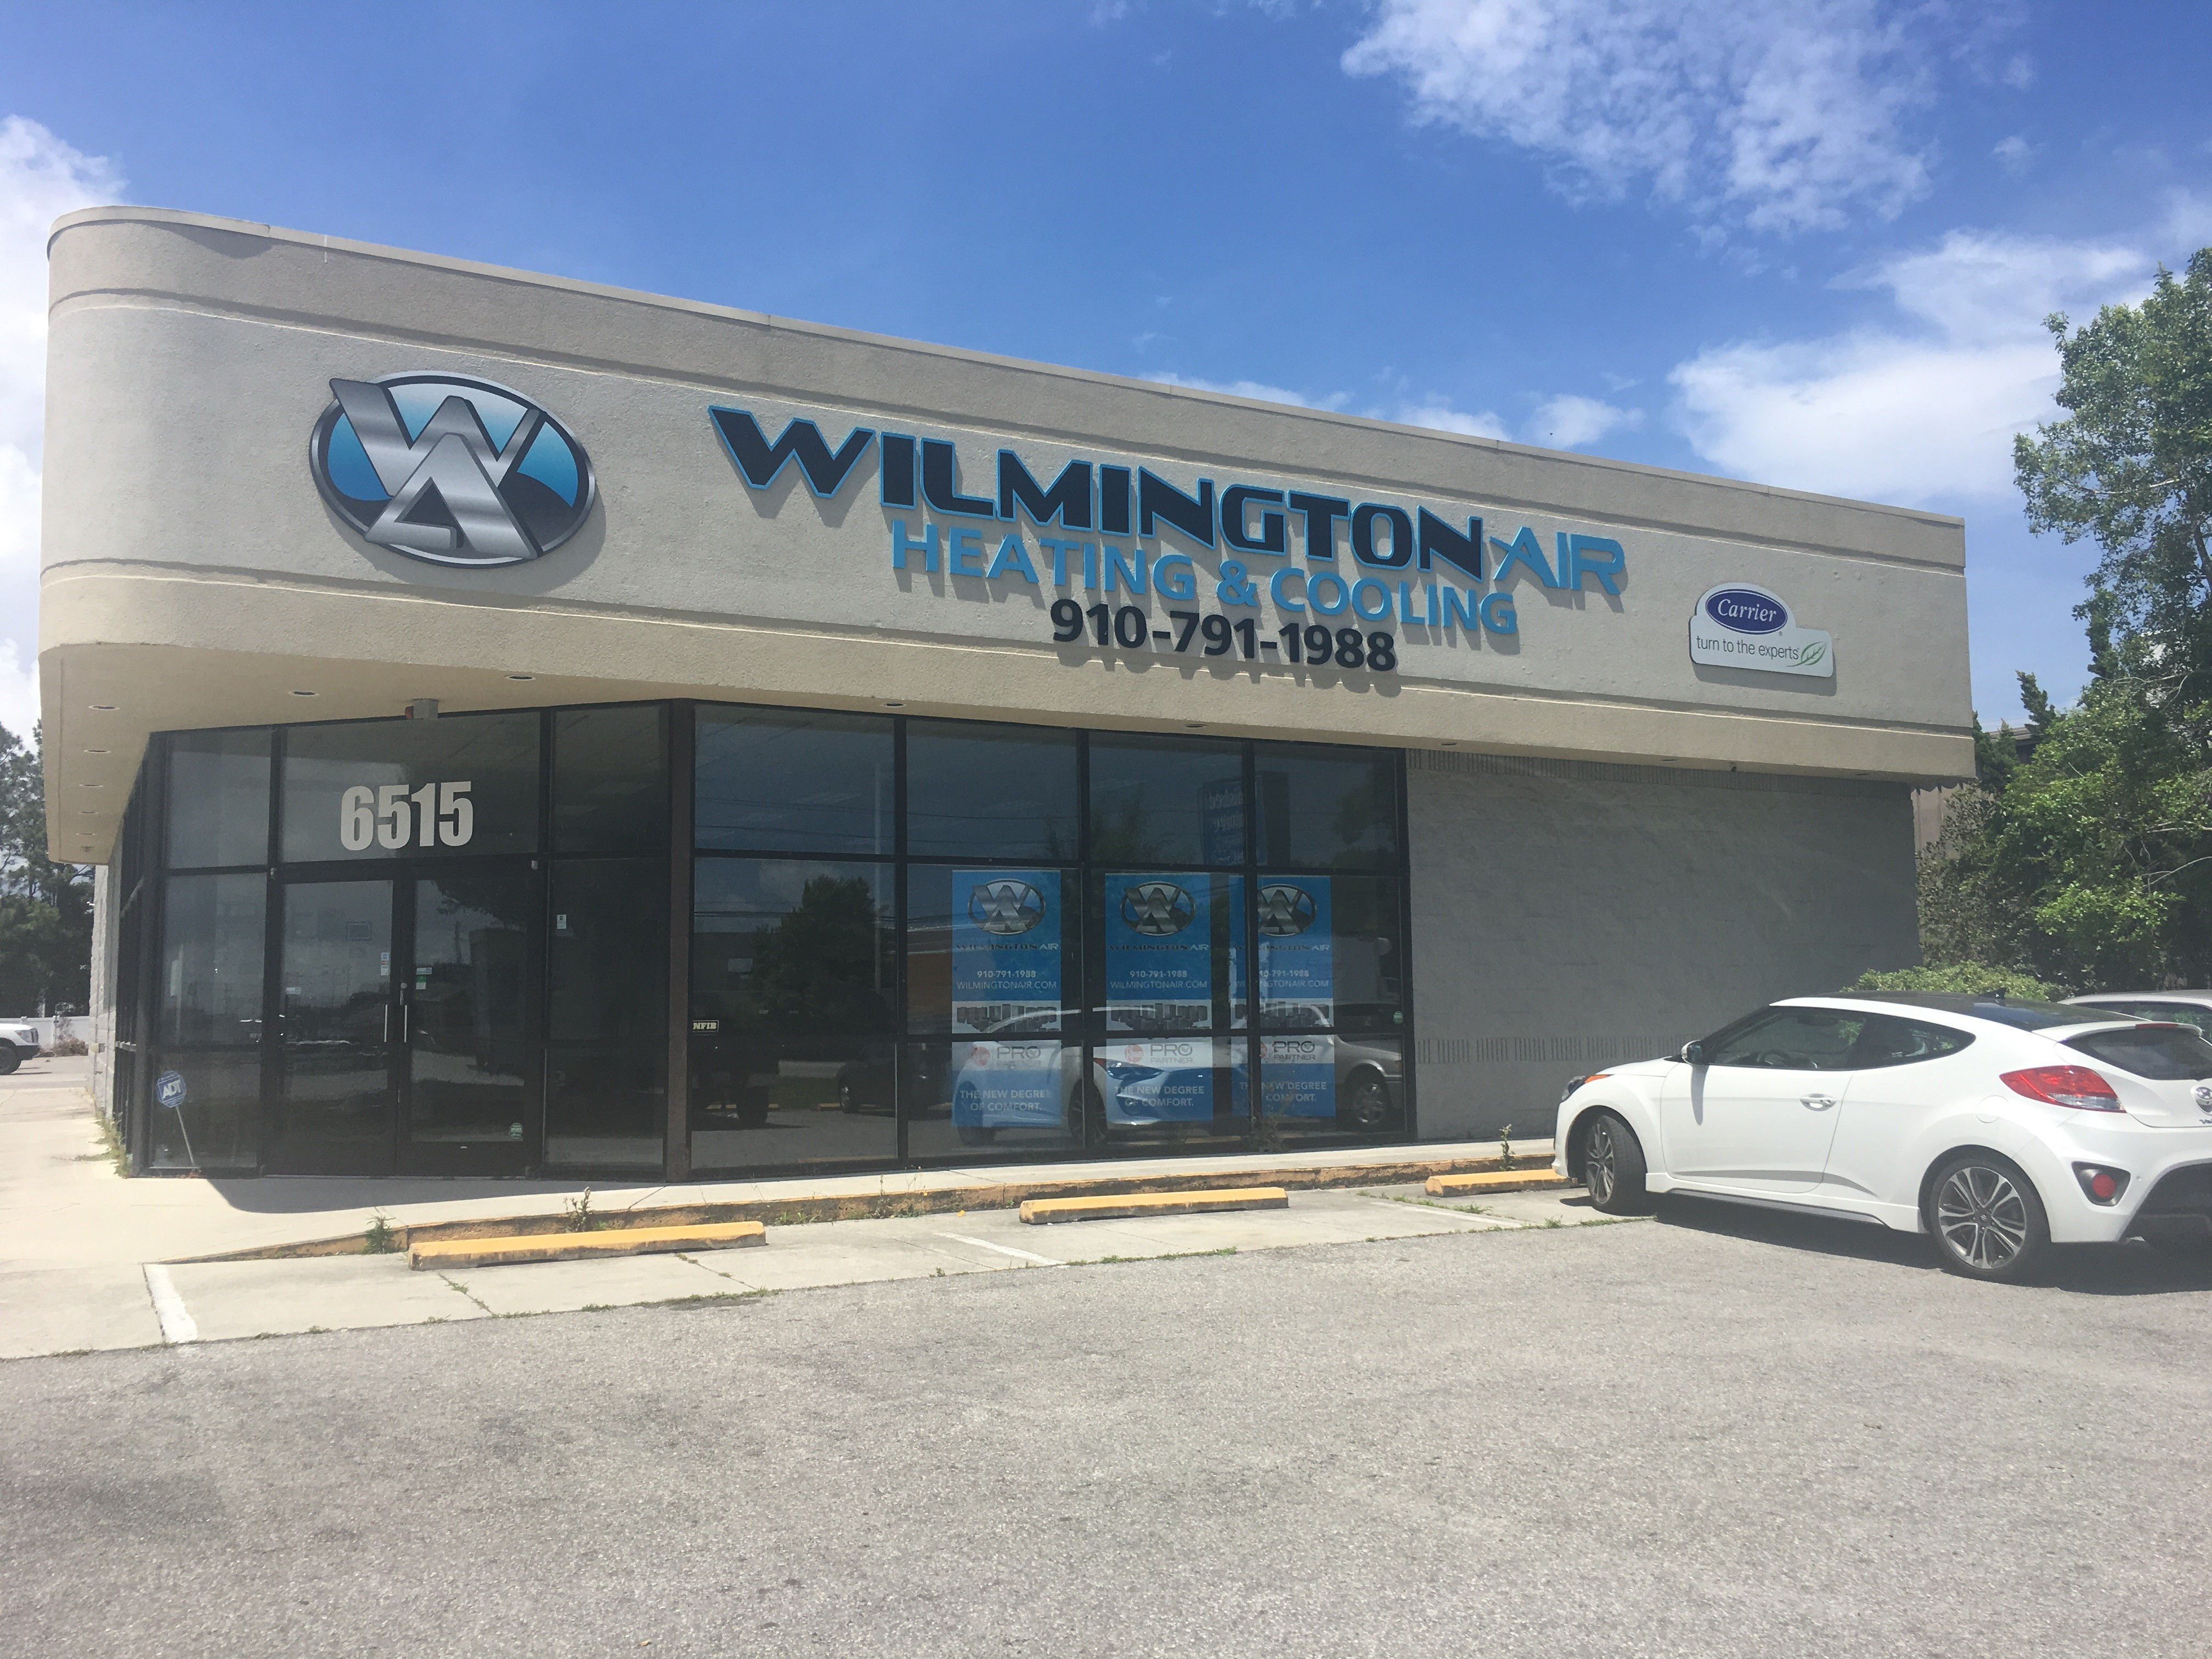 Wilmington Air image 1